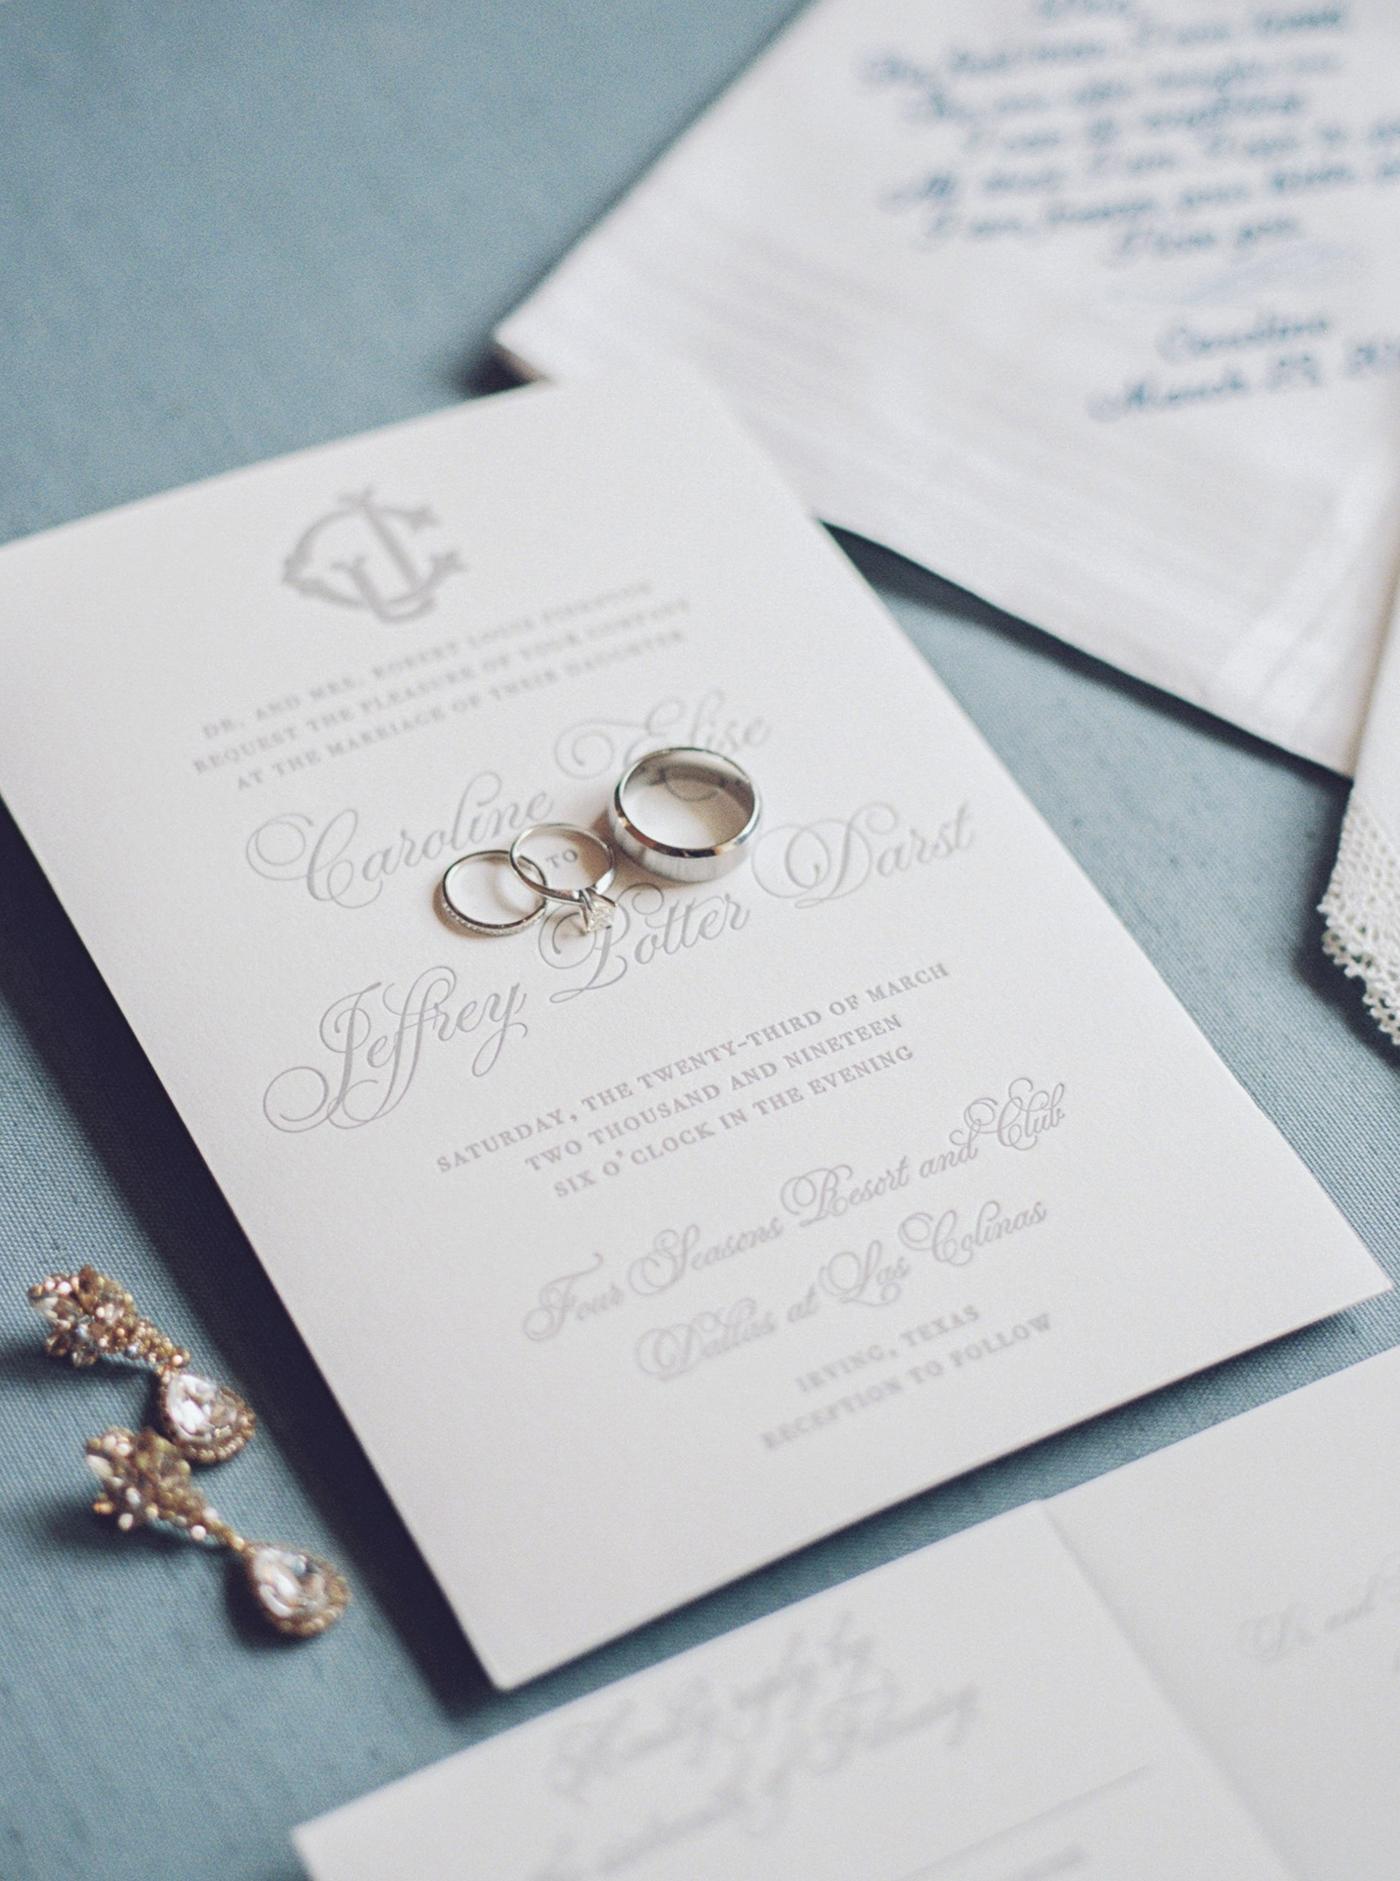 DFW Wedding Planner - Caroline + Jeff at The Four Seasons Hotel Wedding - Allday Events - 3.jpg